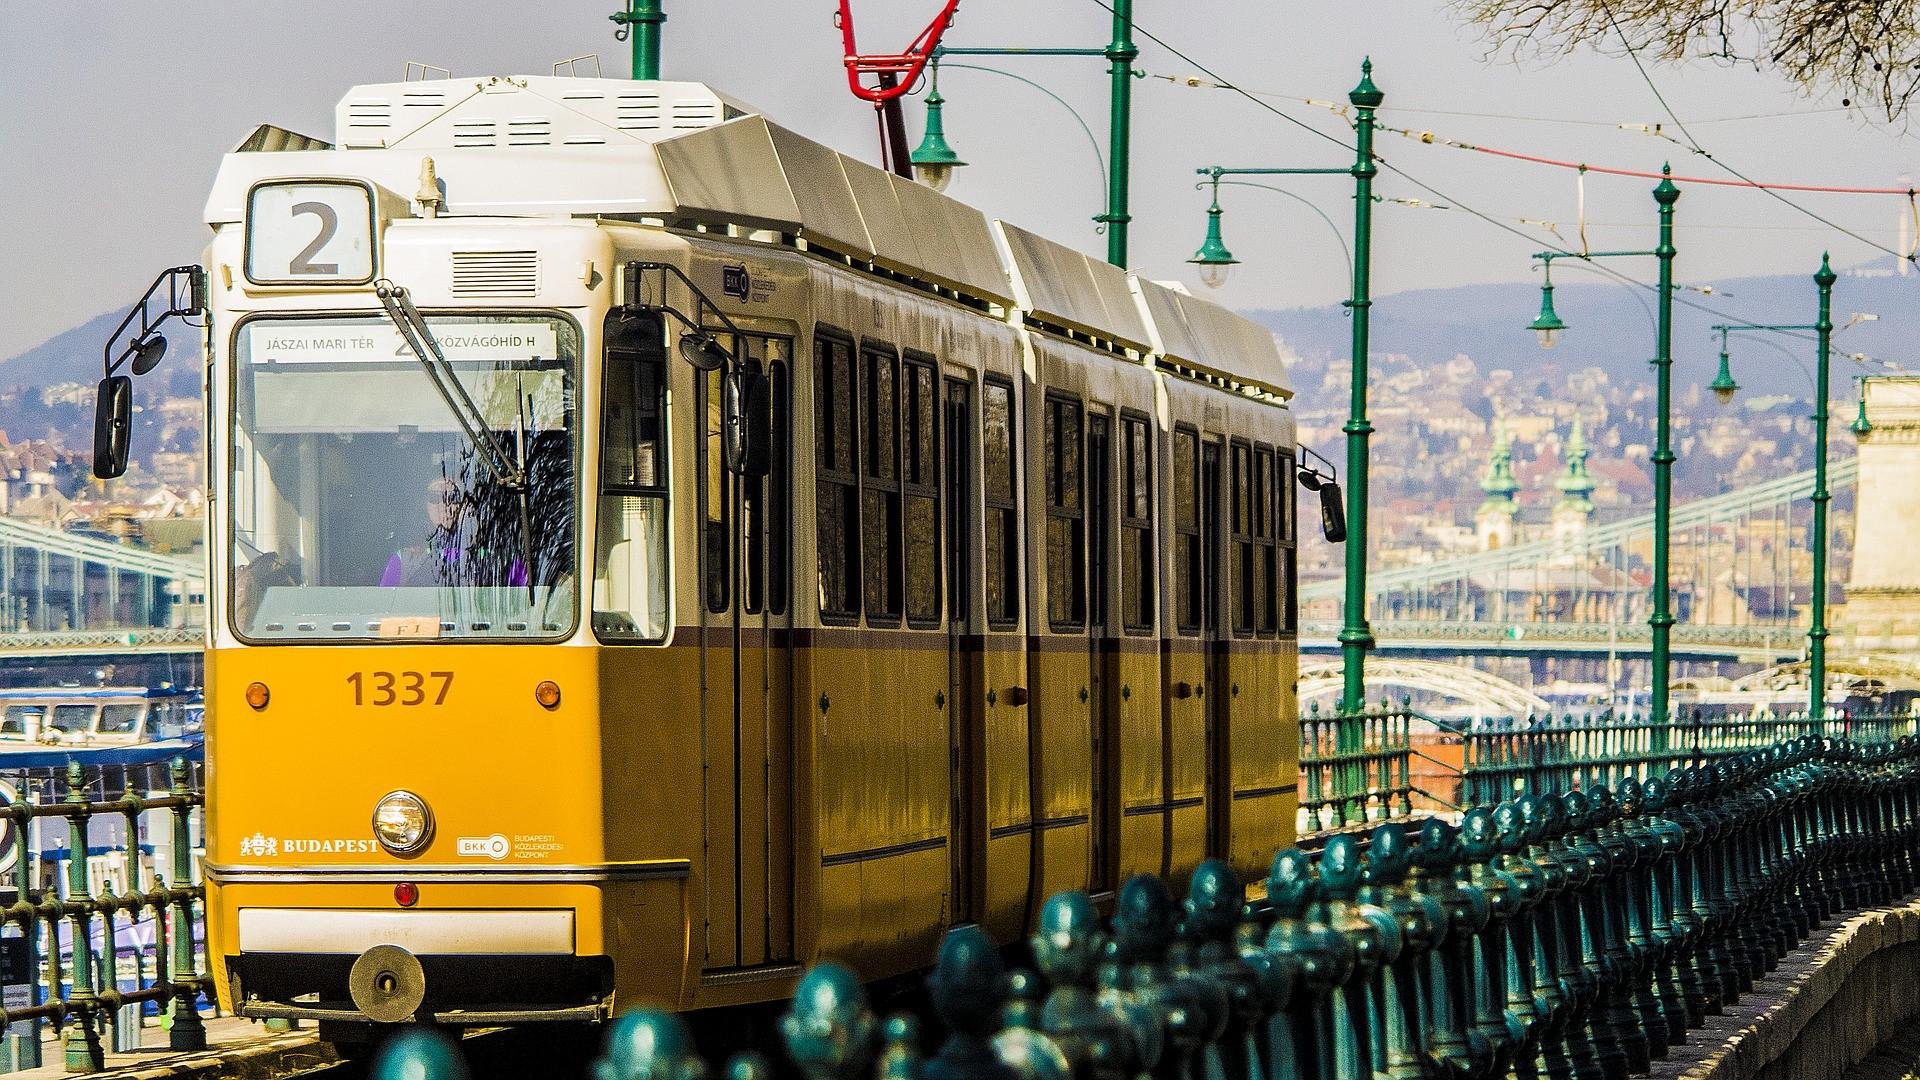 Bud rain tram